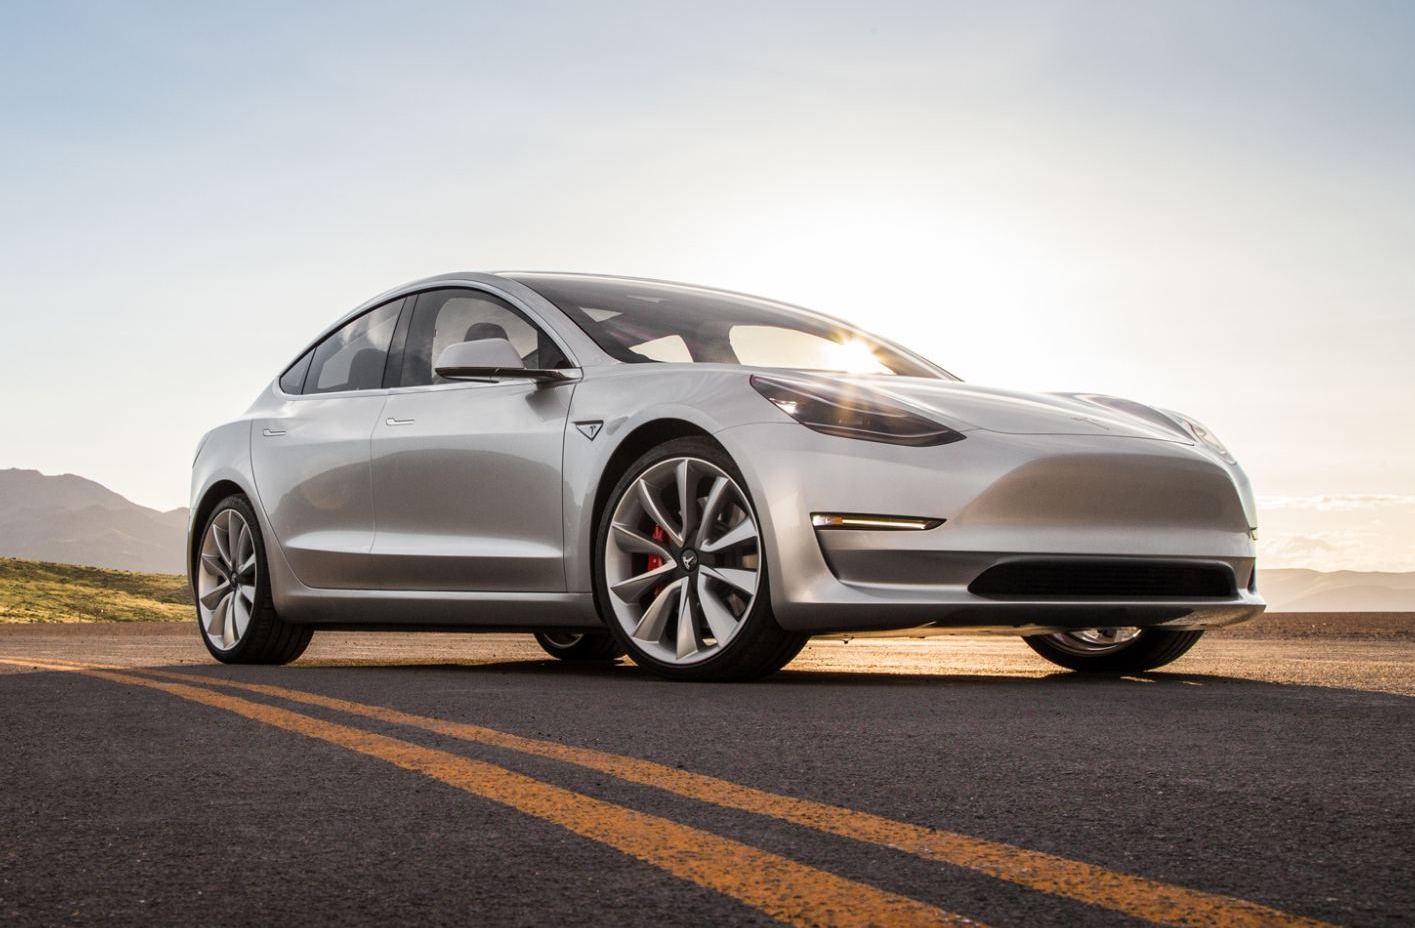 News - Tesla Model 3 On Track For July Production